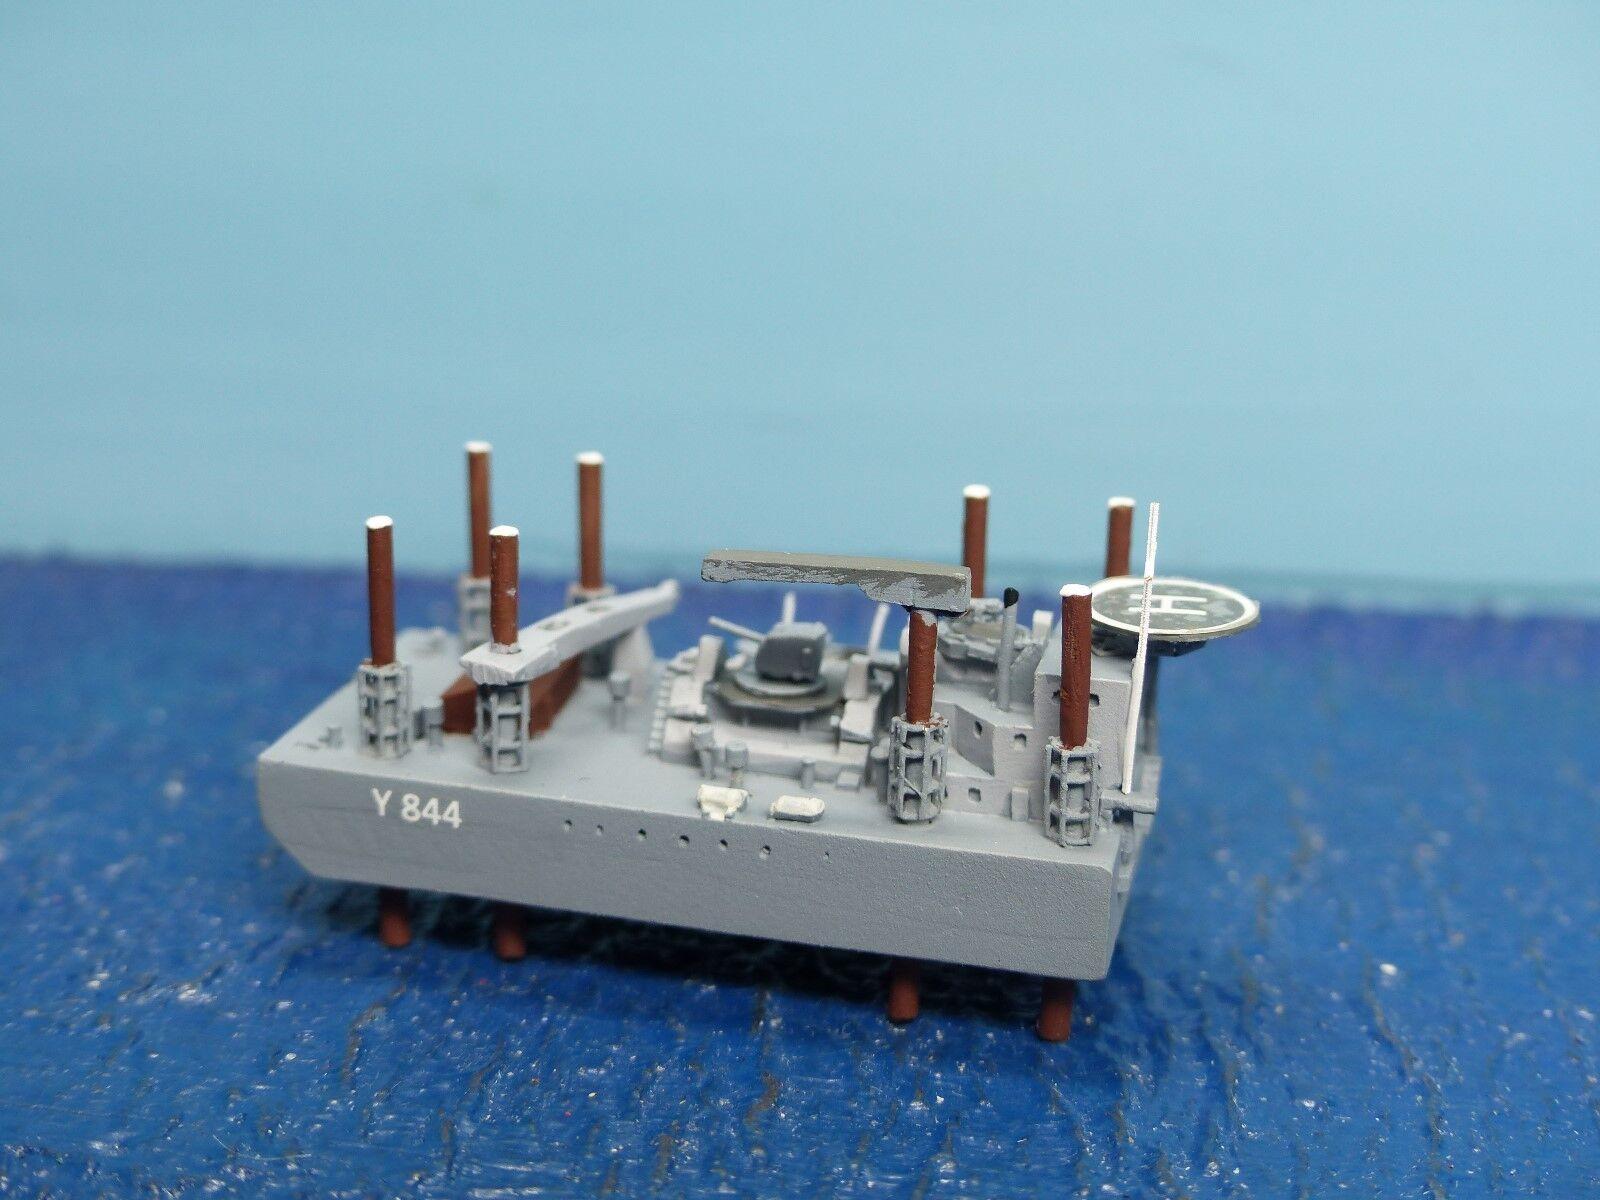 Rodkling navire 1 1250 D. hubinsel  Barbara, y 844 844 844  RK 89 Nouveauté c79aa5